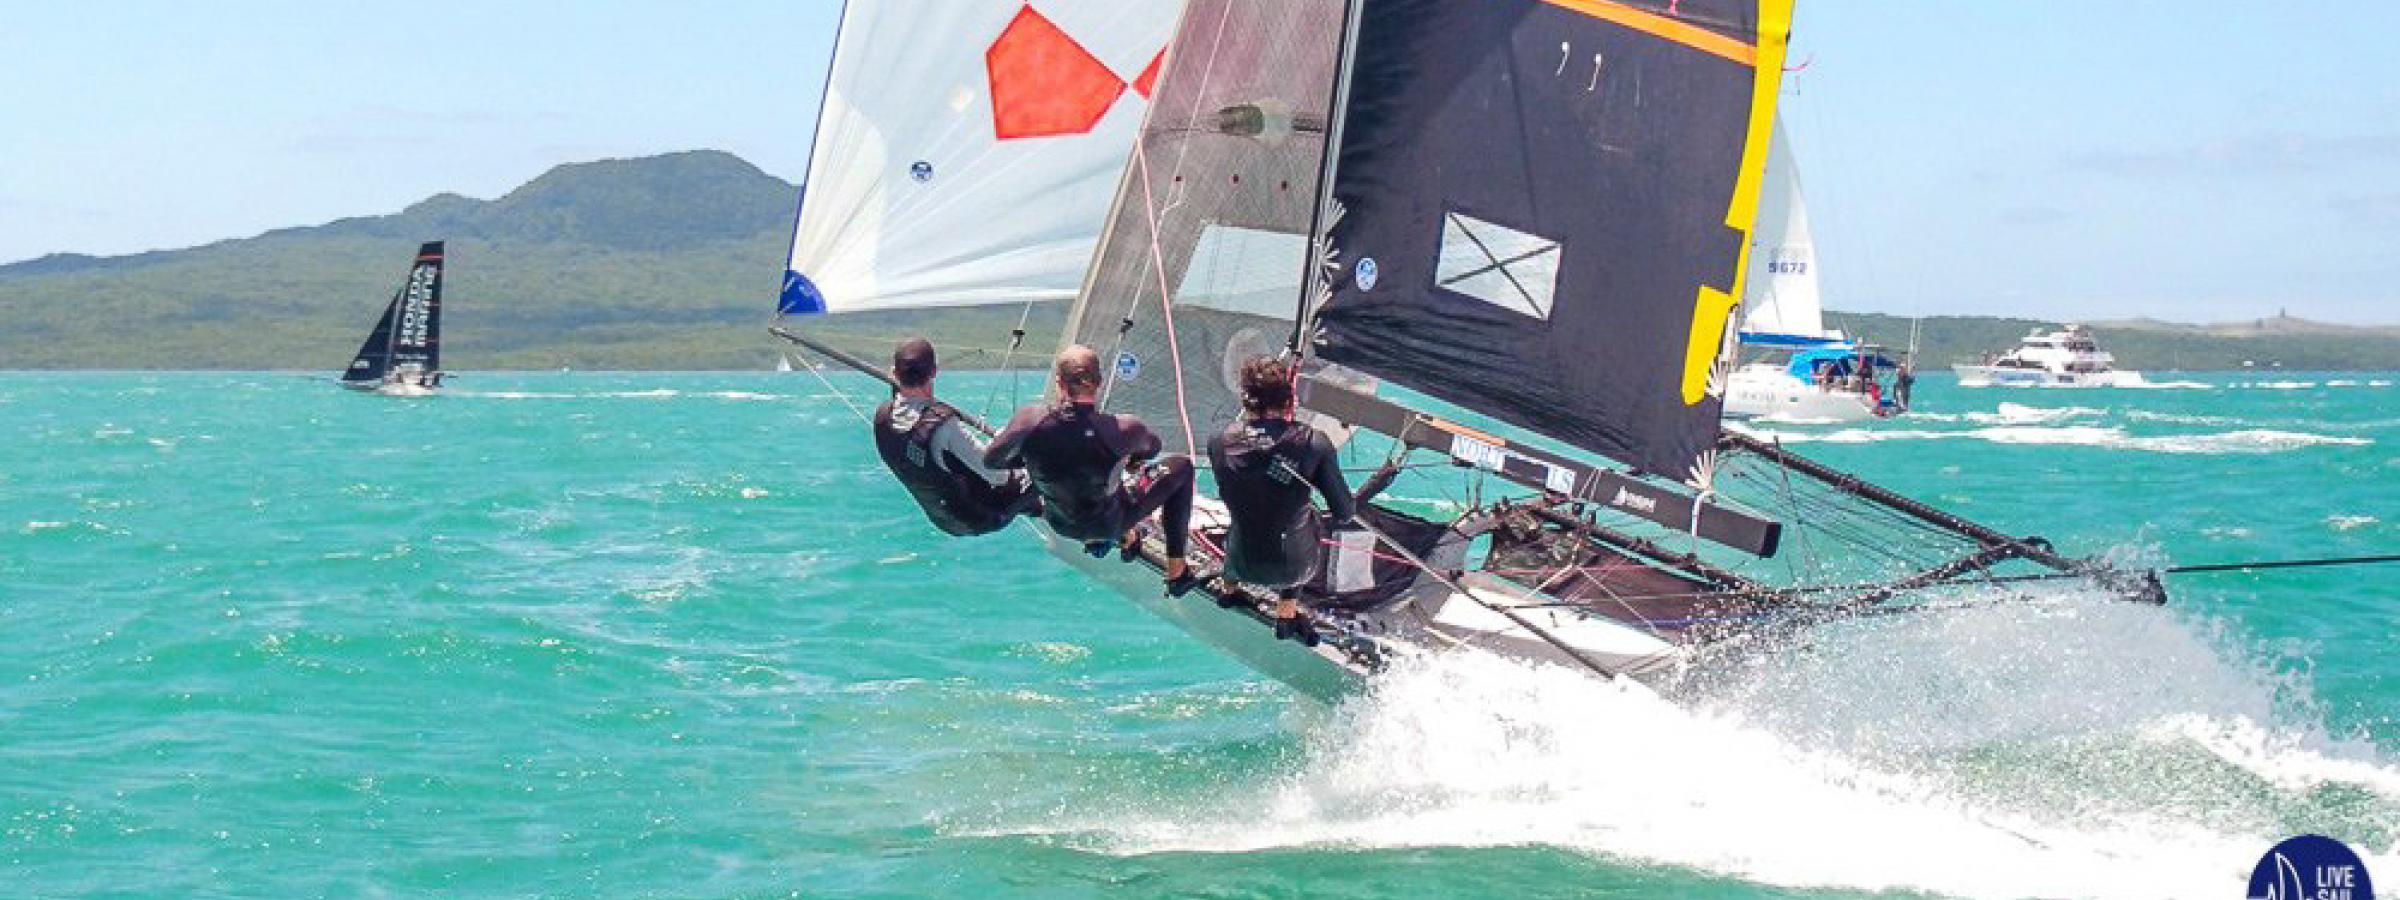 ASCC on their way to winning the 18' skiff national title. Photo: Suellen Davies / Live Sail Die.